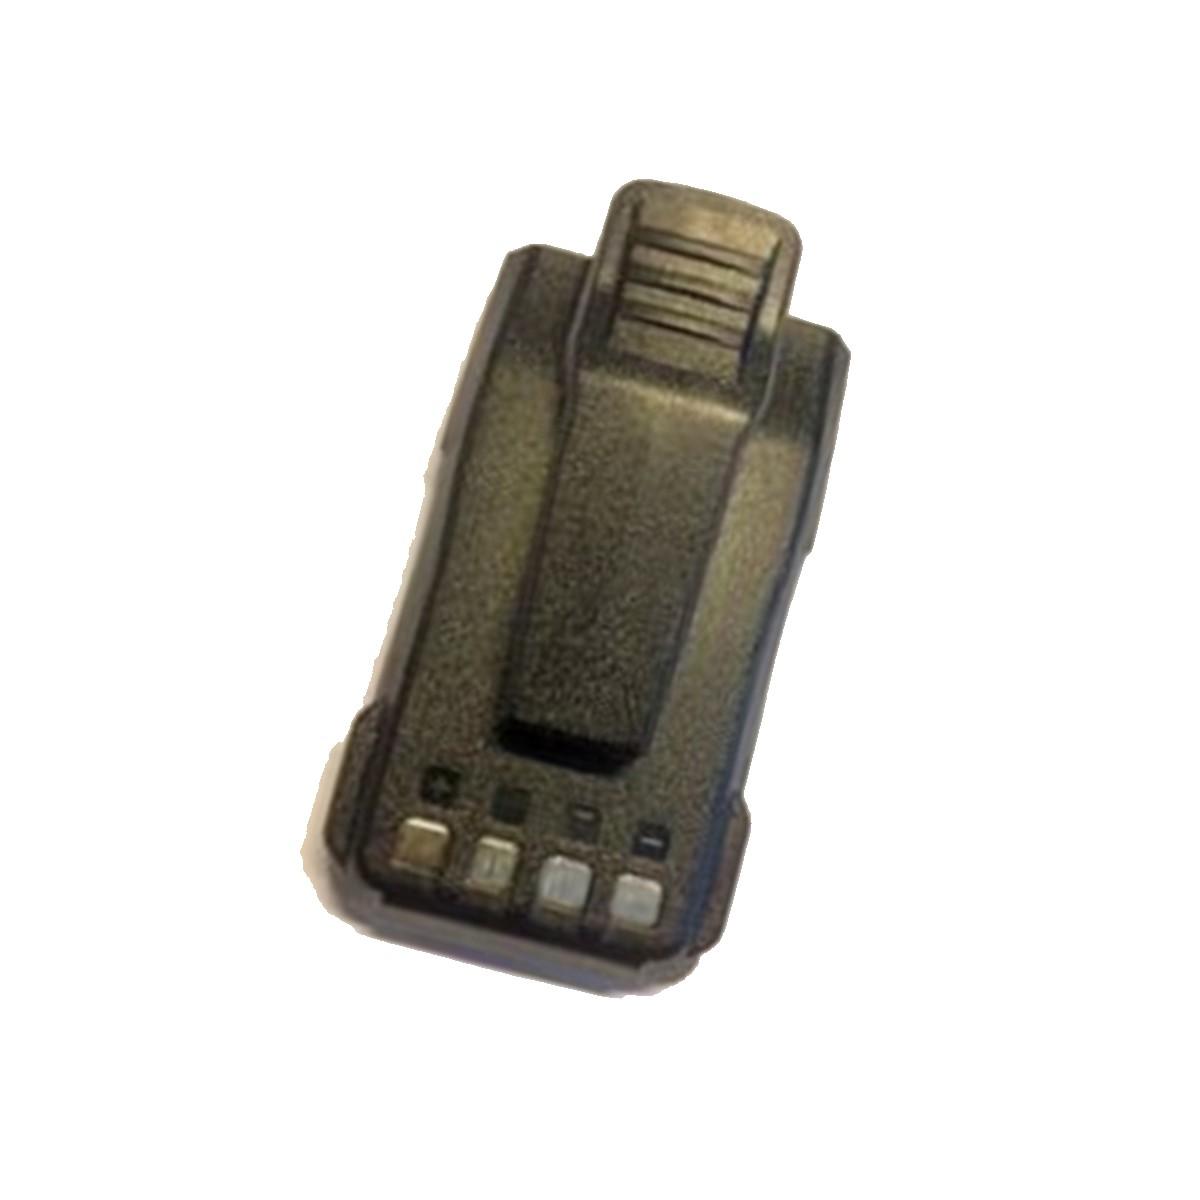 Batería Kirisun Li-Ion 1300 mAh para radio PT3600 KB31A